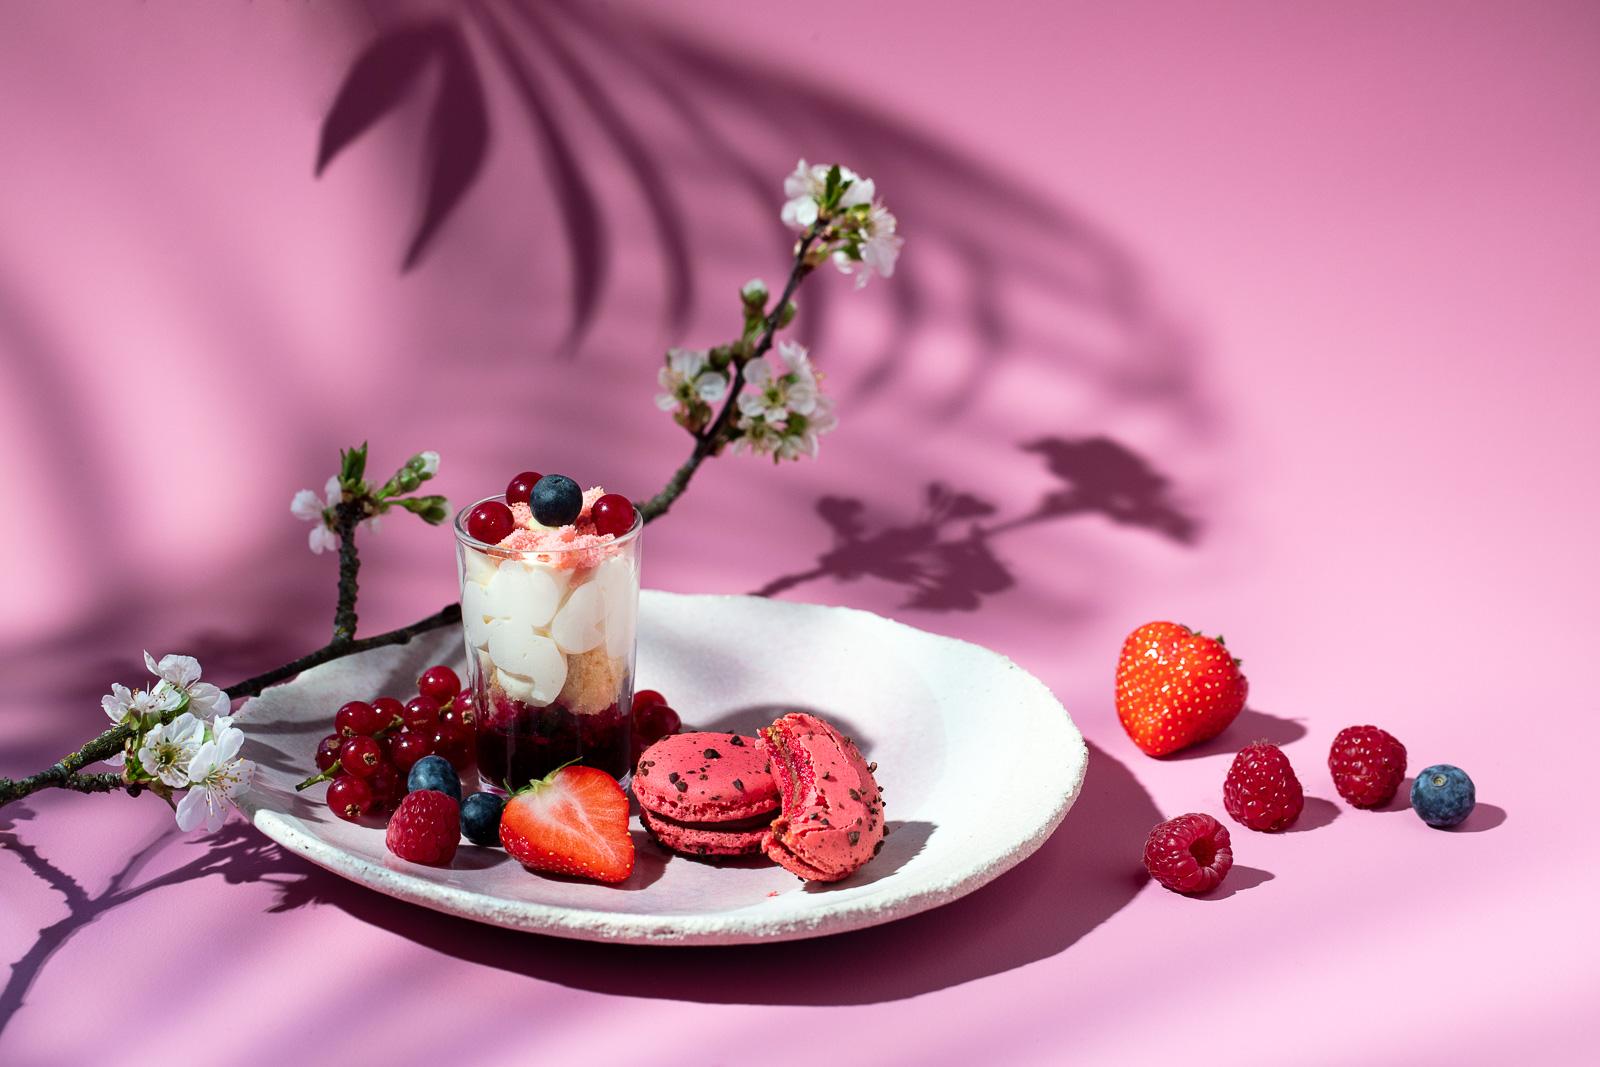 Franck_Hamel_food_photographer_photographeculinaire_valerie_paumelle_agent_st_clair_traiteur (12).jpg